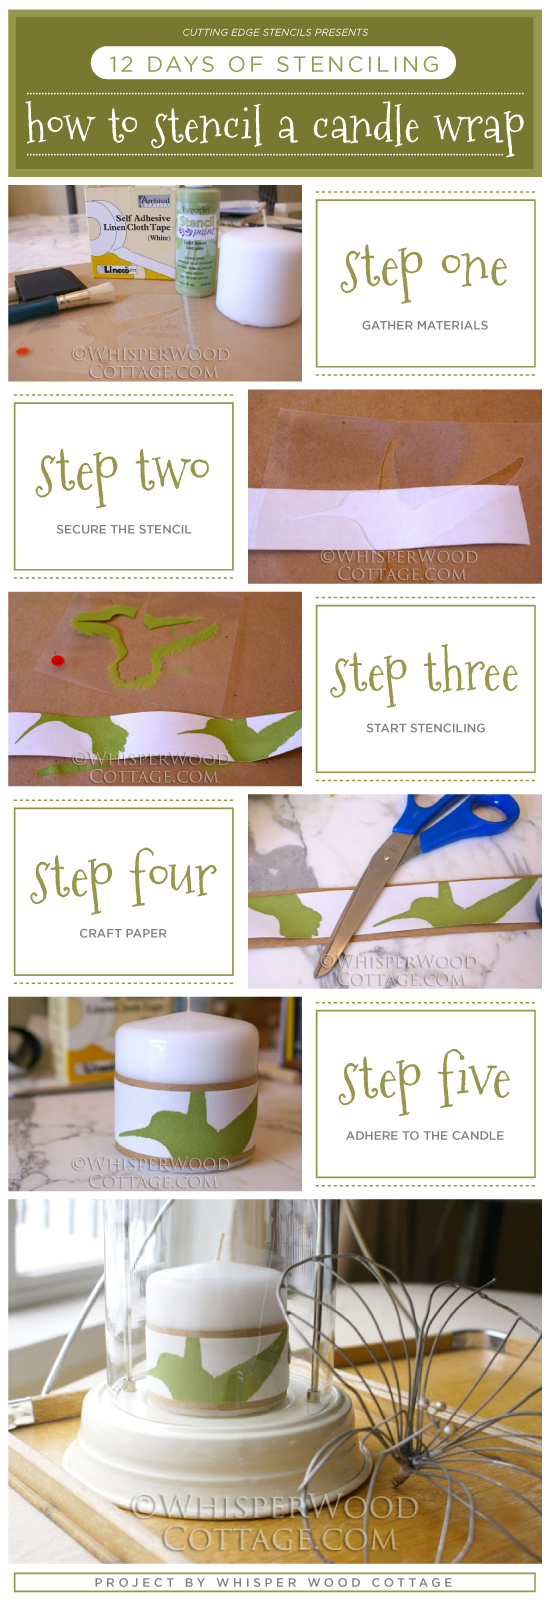 Cutting Edge Stencils shares how to stencil a DIY candle wrap using the Happy Hour bird Pattern. http://www.cuttingedgestencils.com/hummingbird-stencil.html